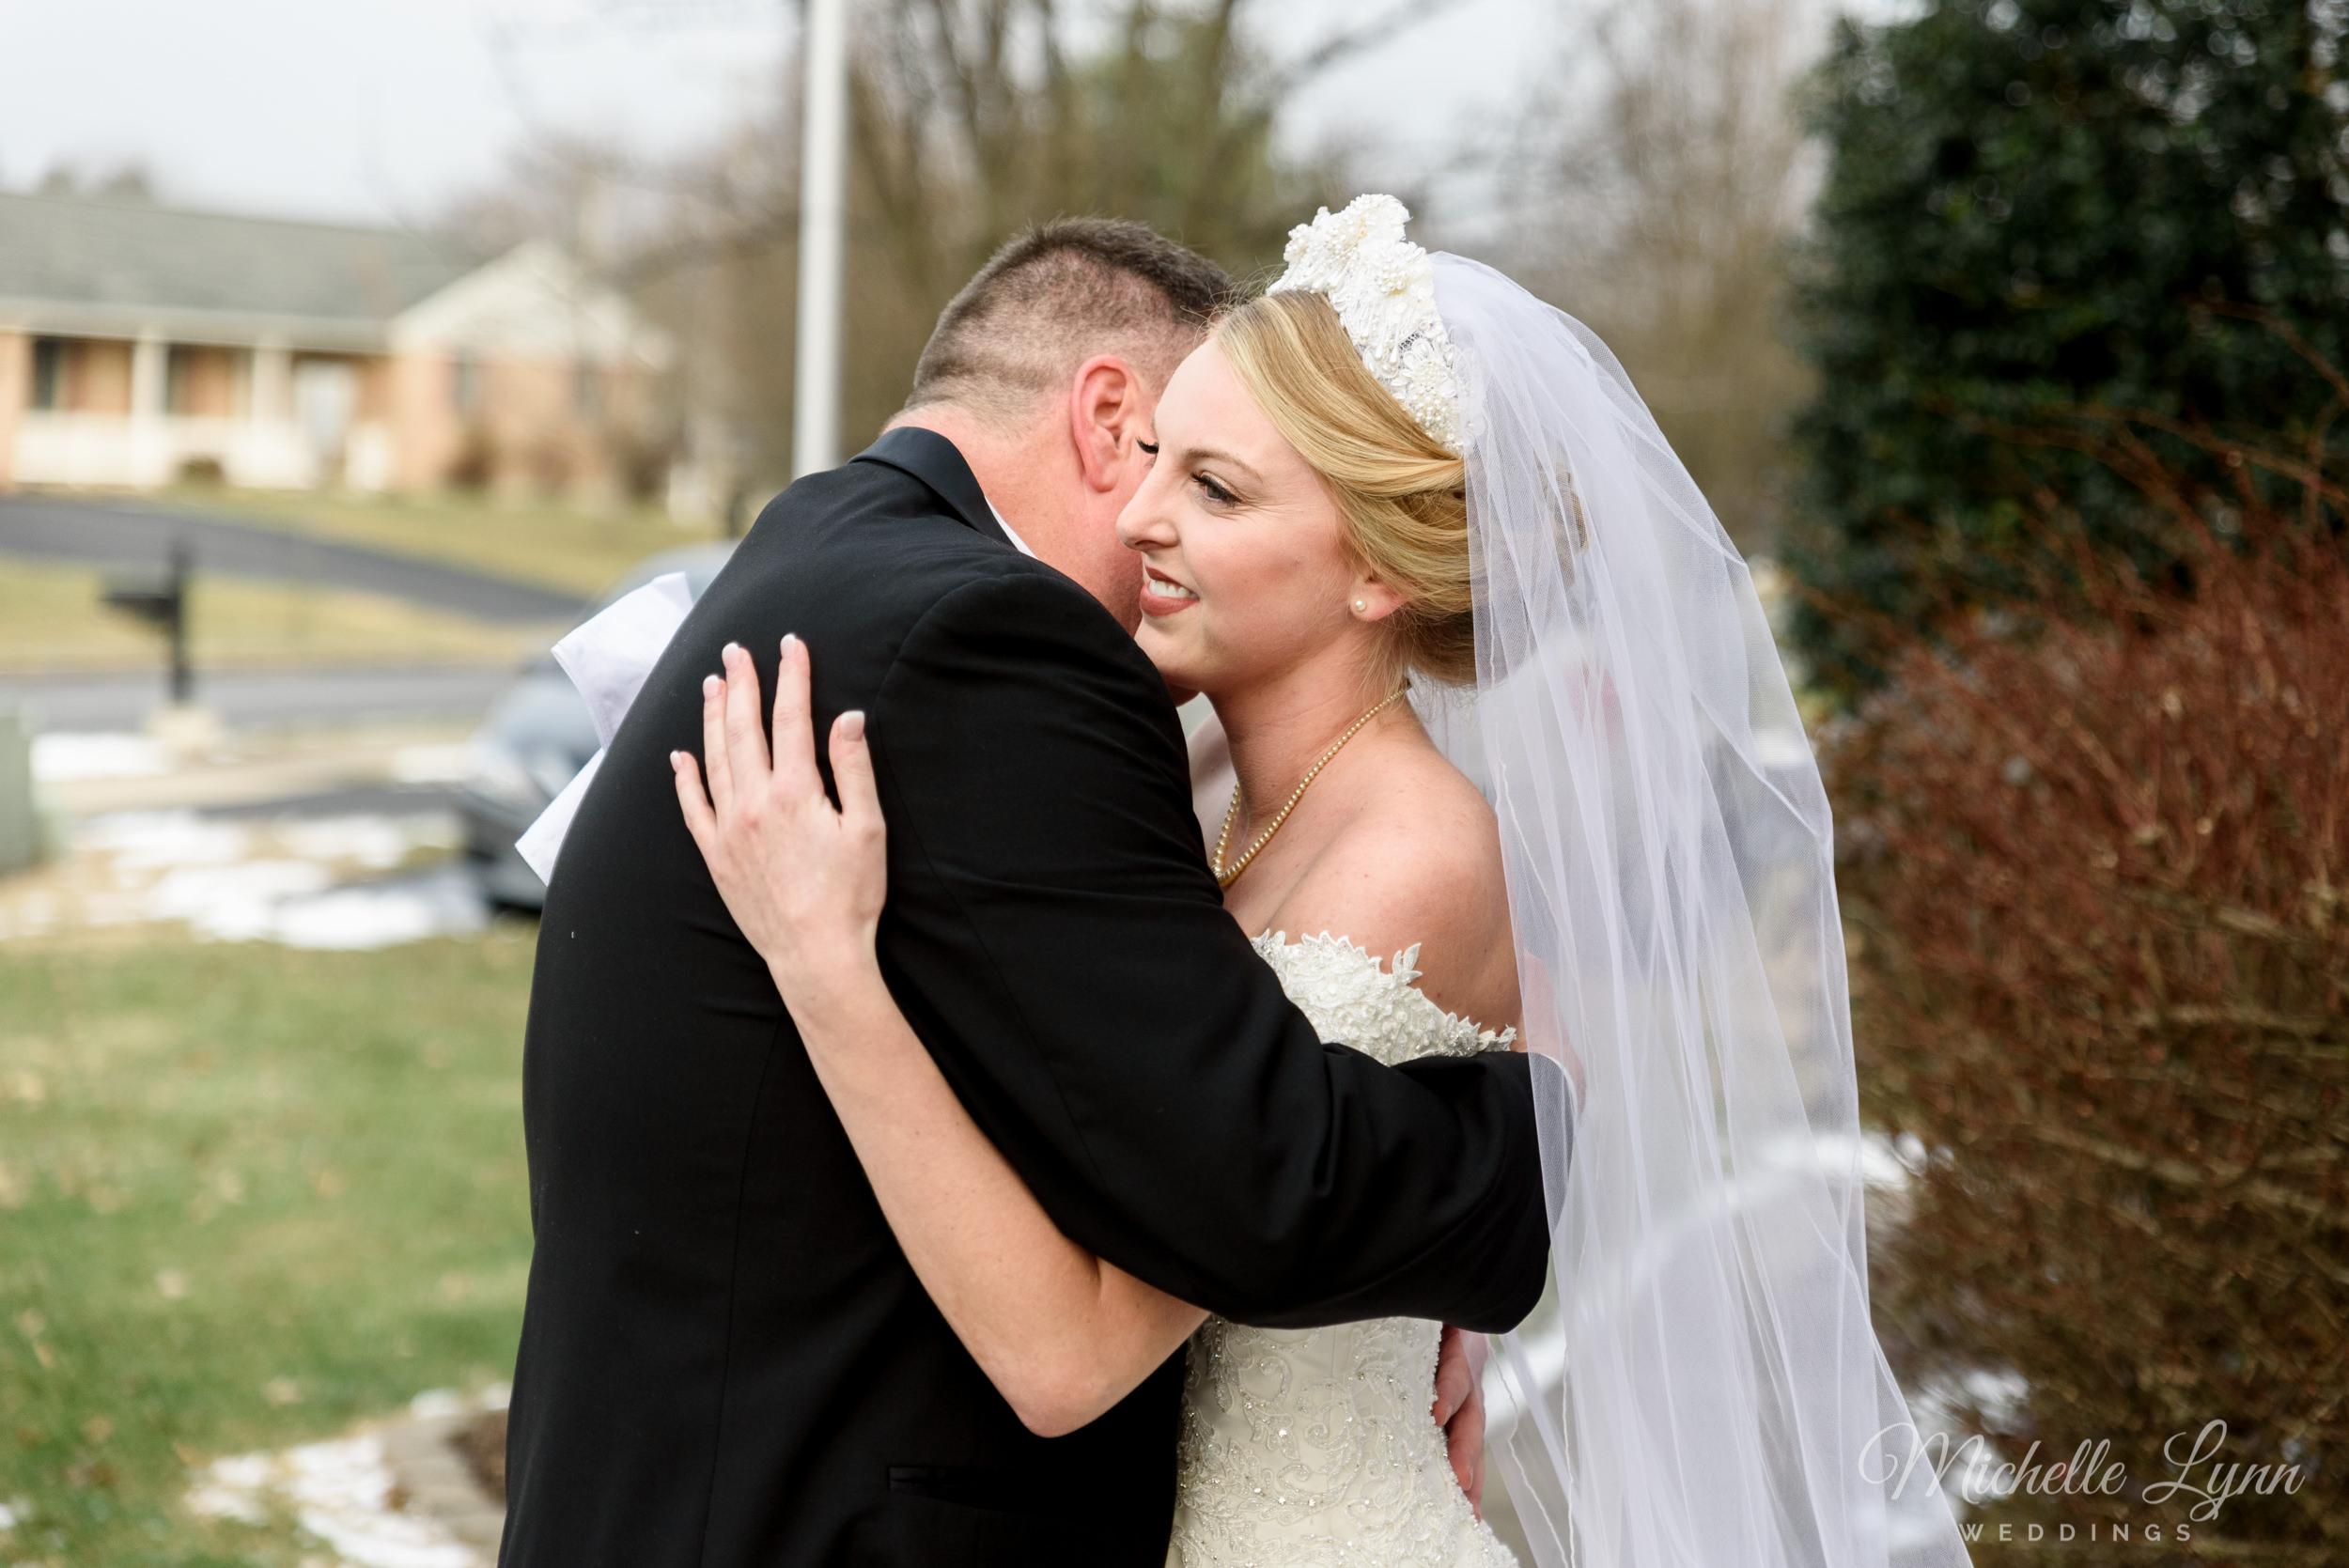 william-penn-inn-wedding-photography-mlw-21.jpg